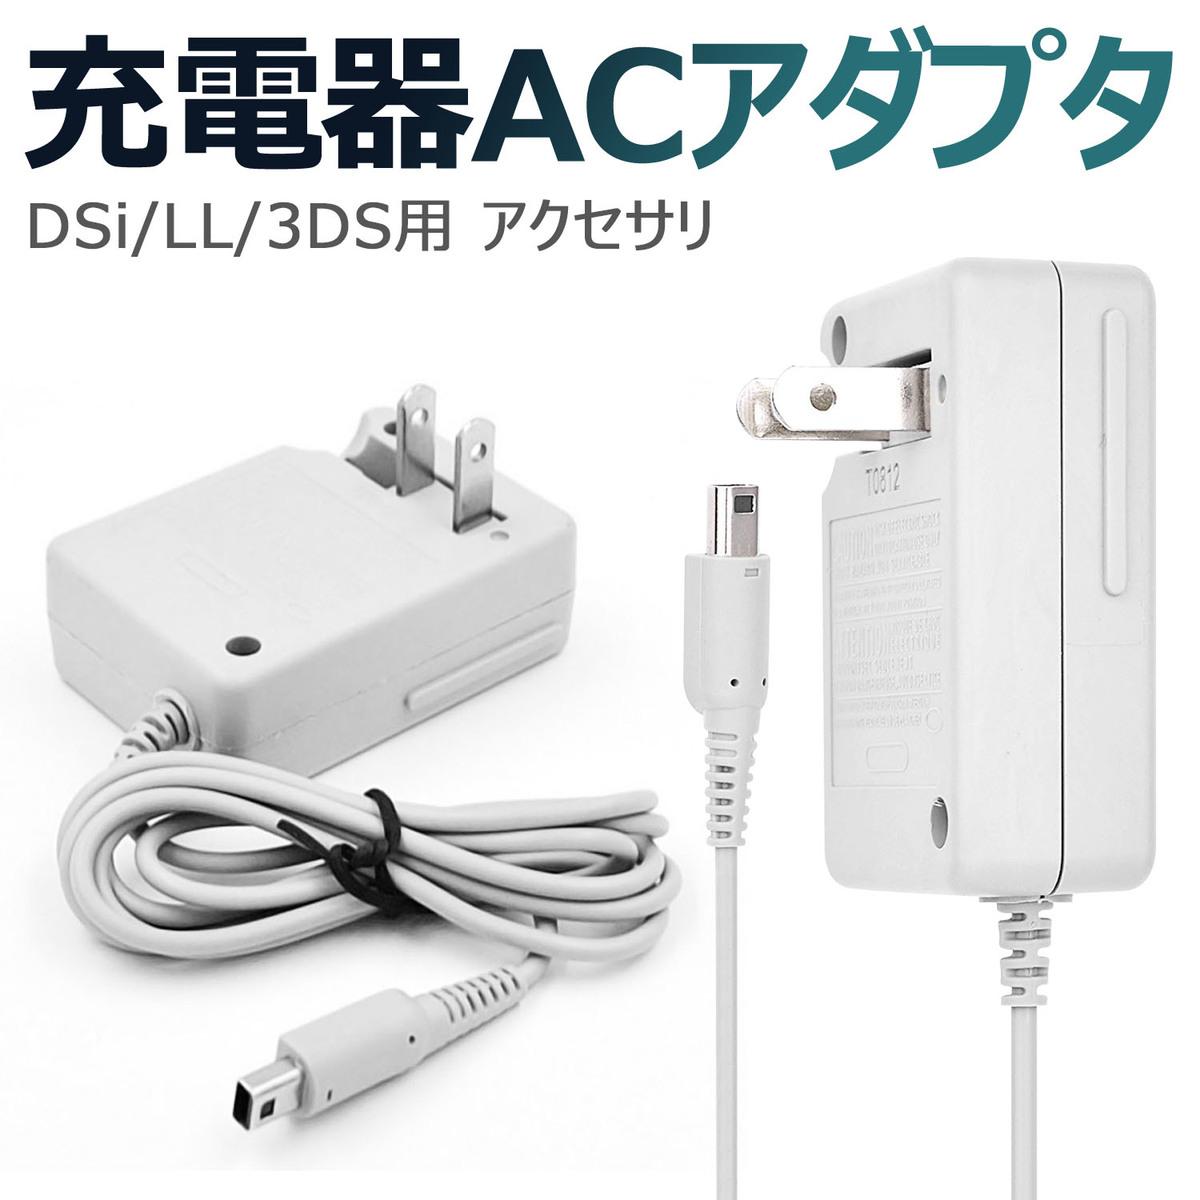 DSi LL 3DS用 充電器 ACアダプタ メール便 SALENEW大人気! 送料無料 アクセサリ AC 任天堂 アダプター ニンテンドー DSiLL対応 充電ケーブル 受注生産品